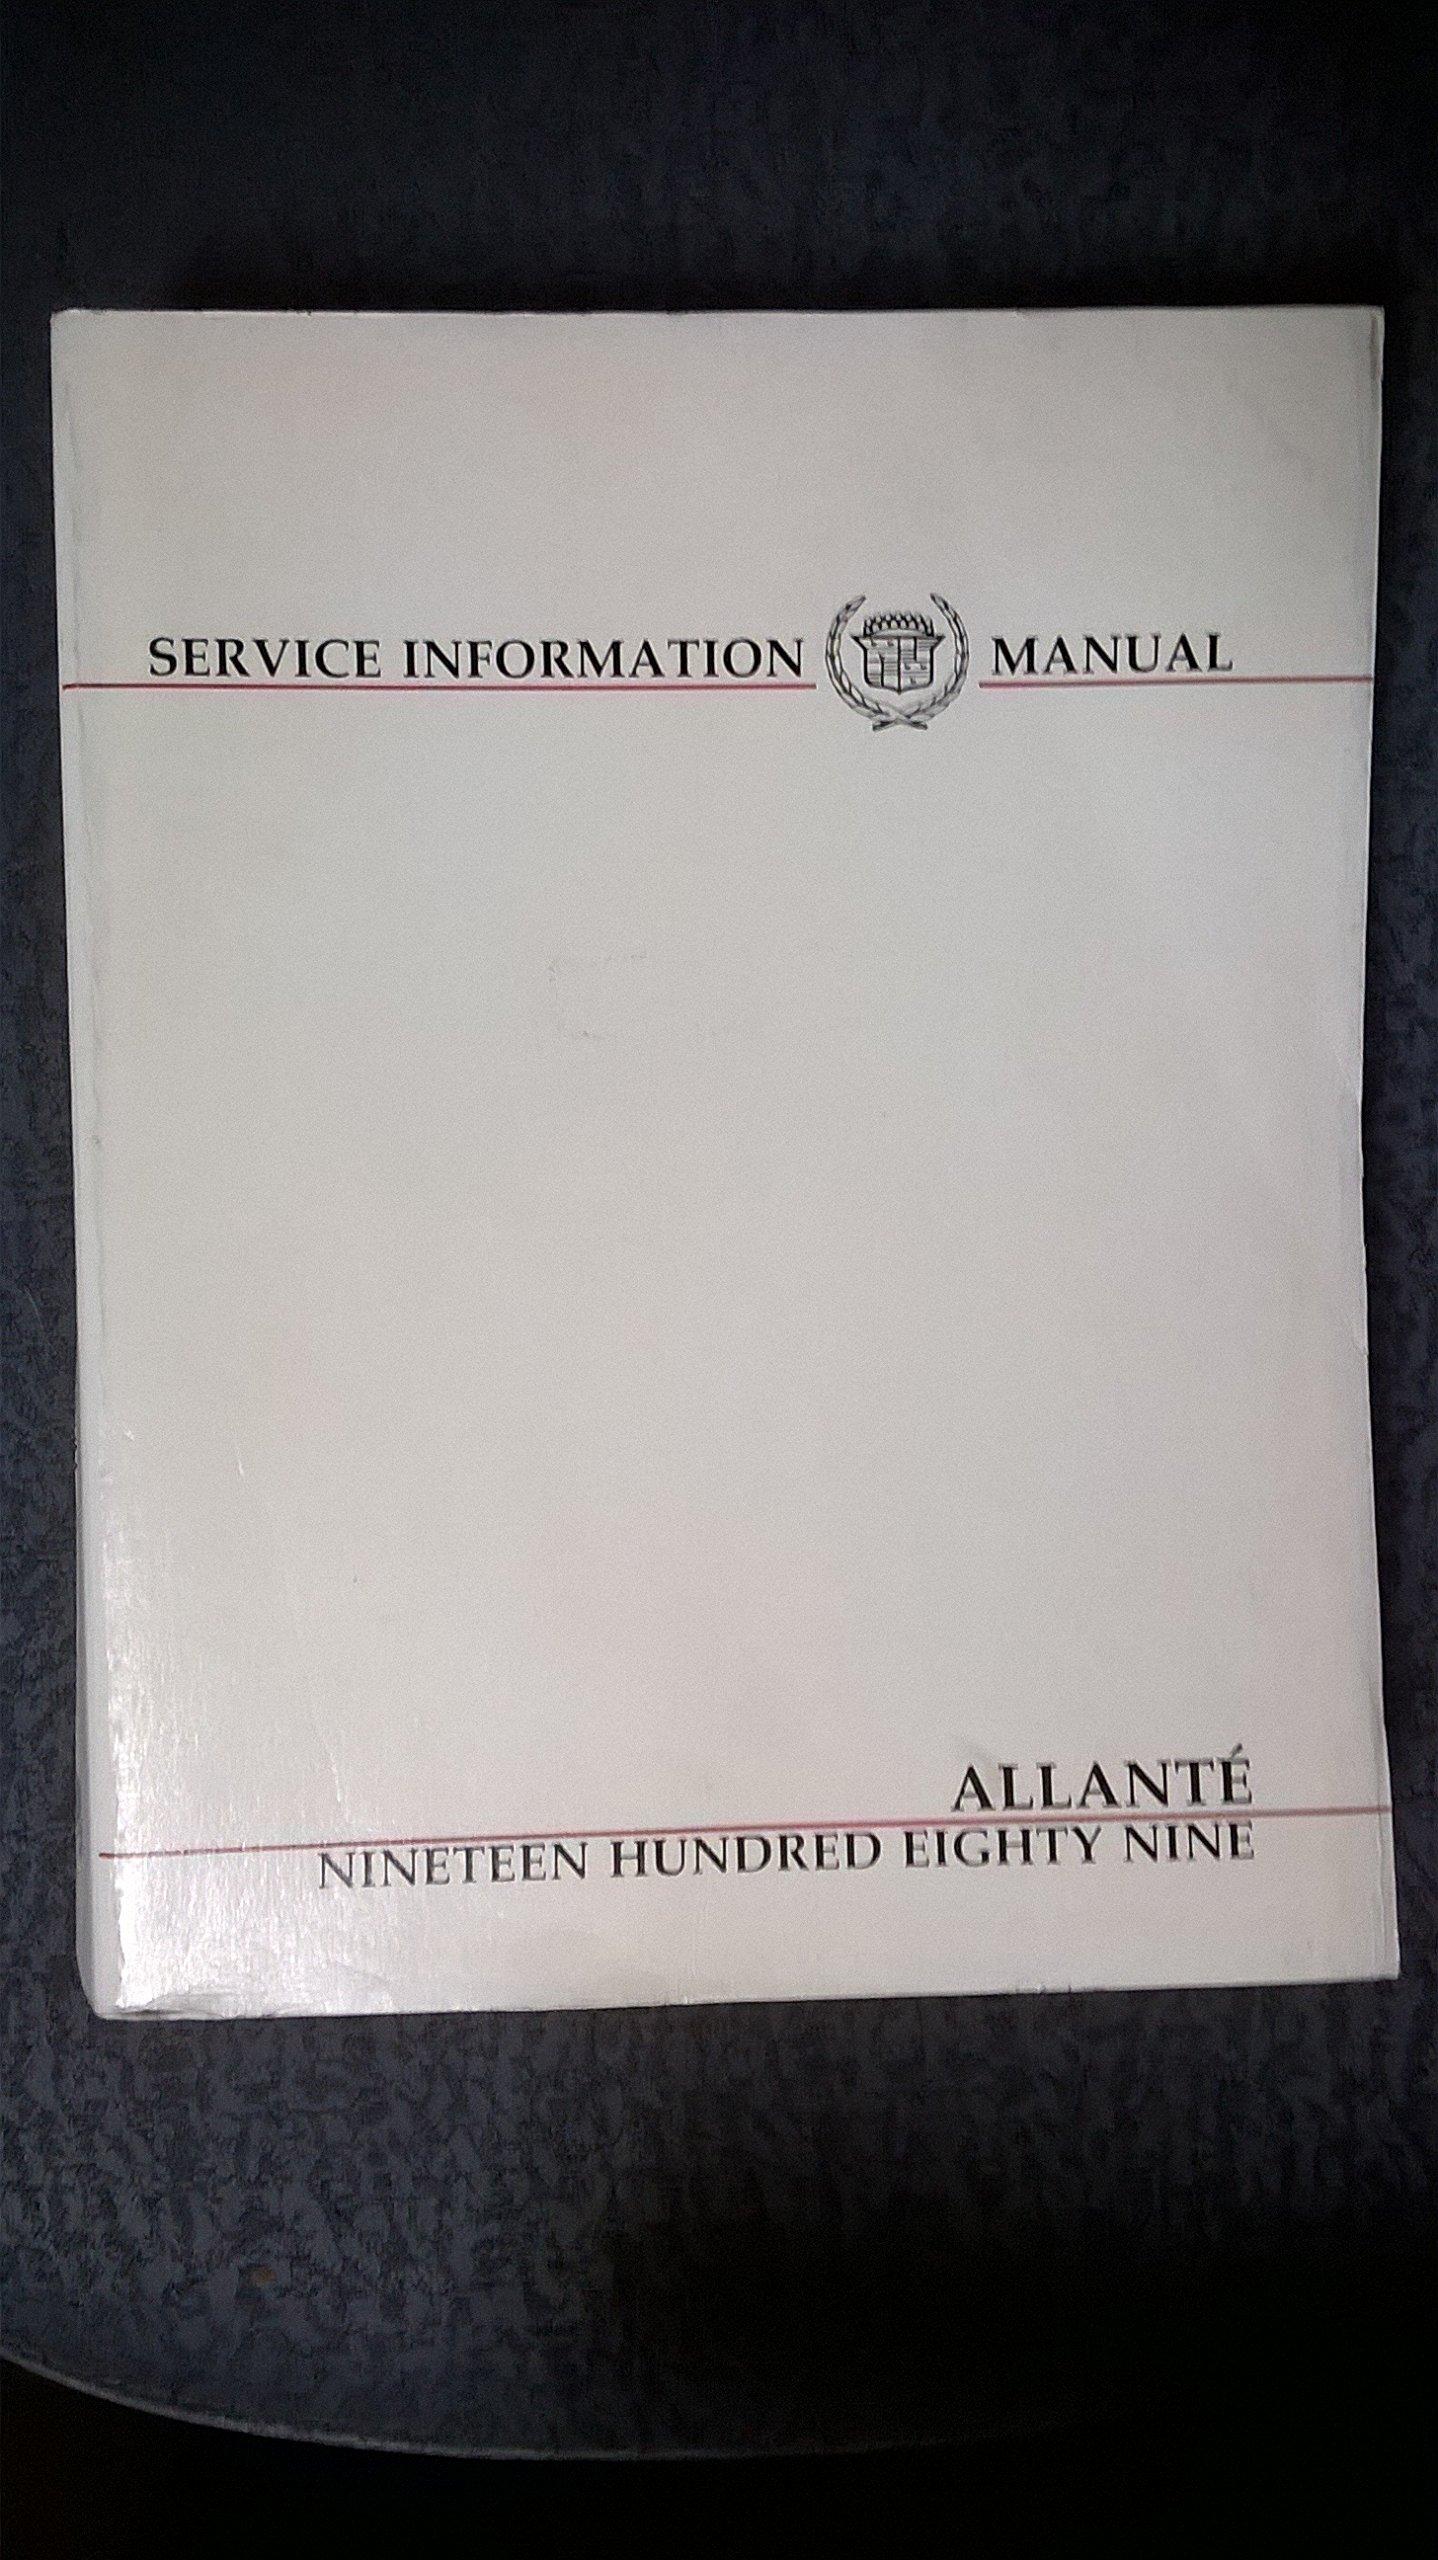 1989 Cadillac Allante Service Information Manual: Cadillac Motor Car  Division, Illustrated: Amazon.com: Books